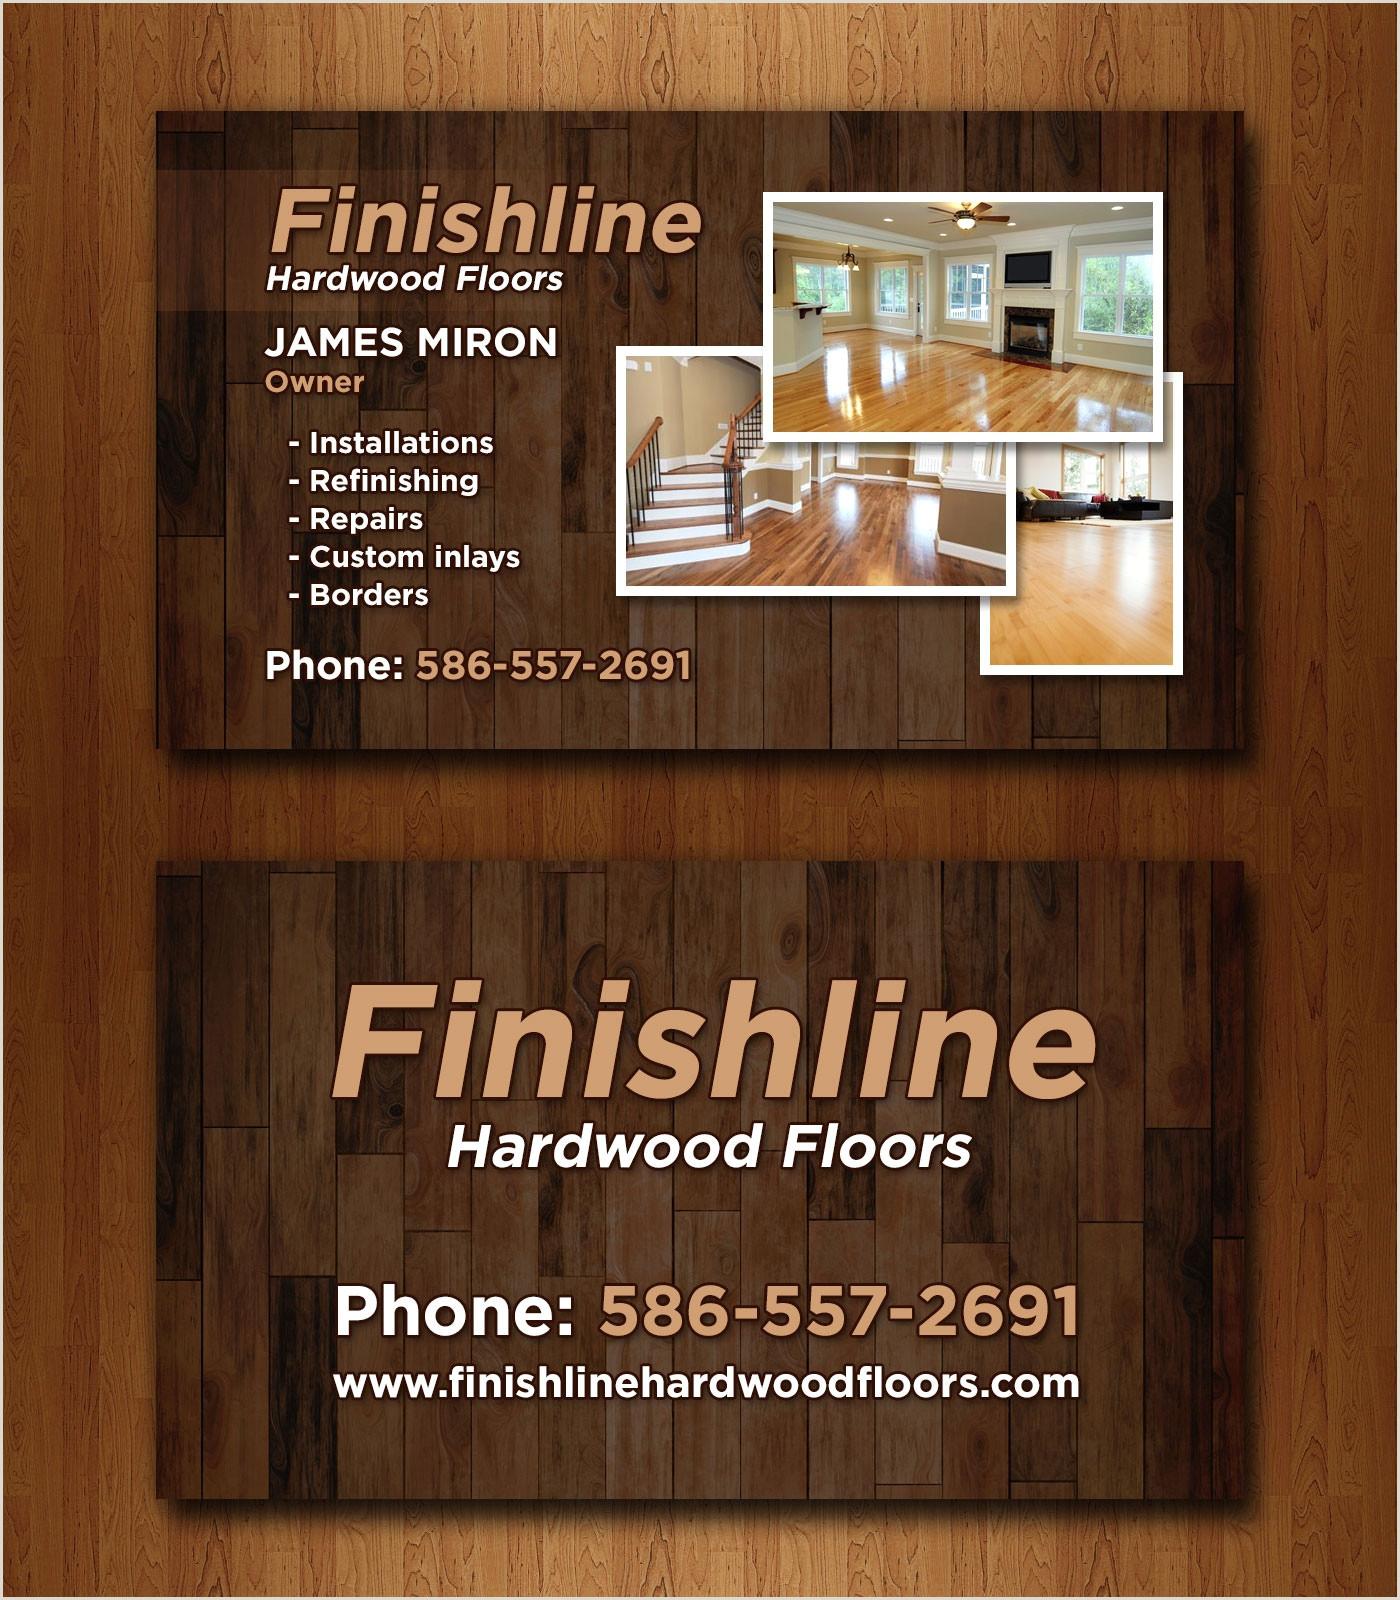 How To Make A Good Business Card 14 Popular Hardwood Flooring Business Card Template